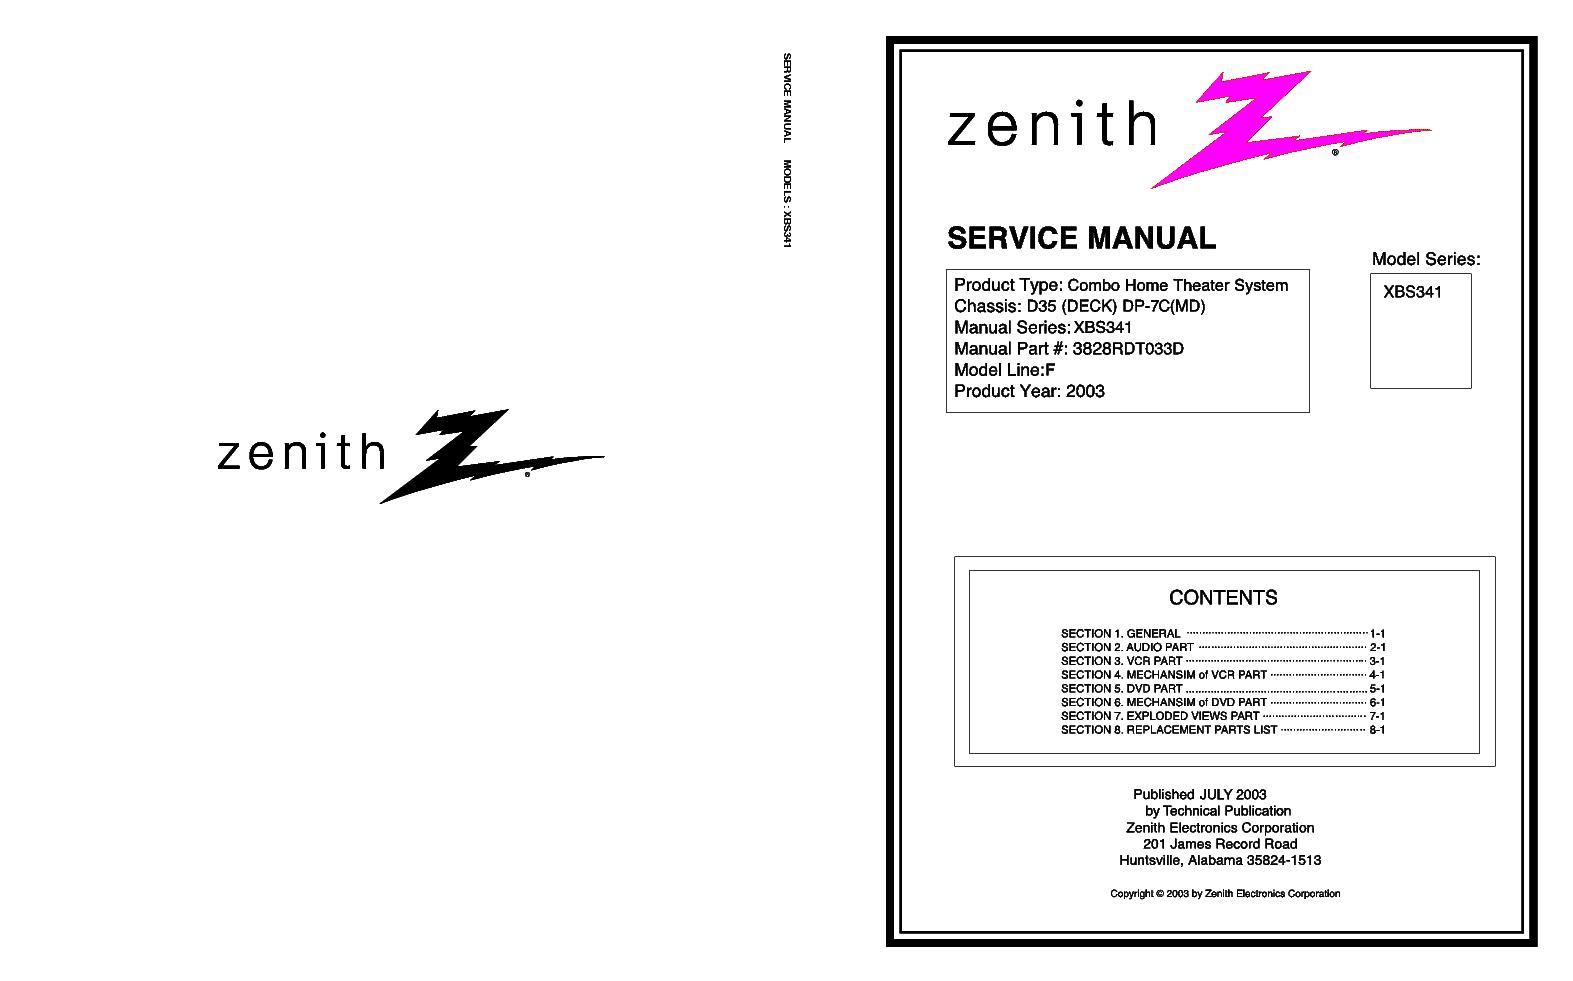 Zenith Royal D 1 2 Sch Service Manual Download